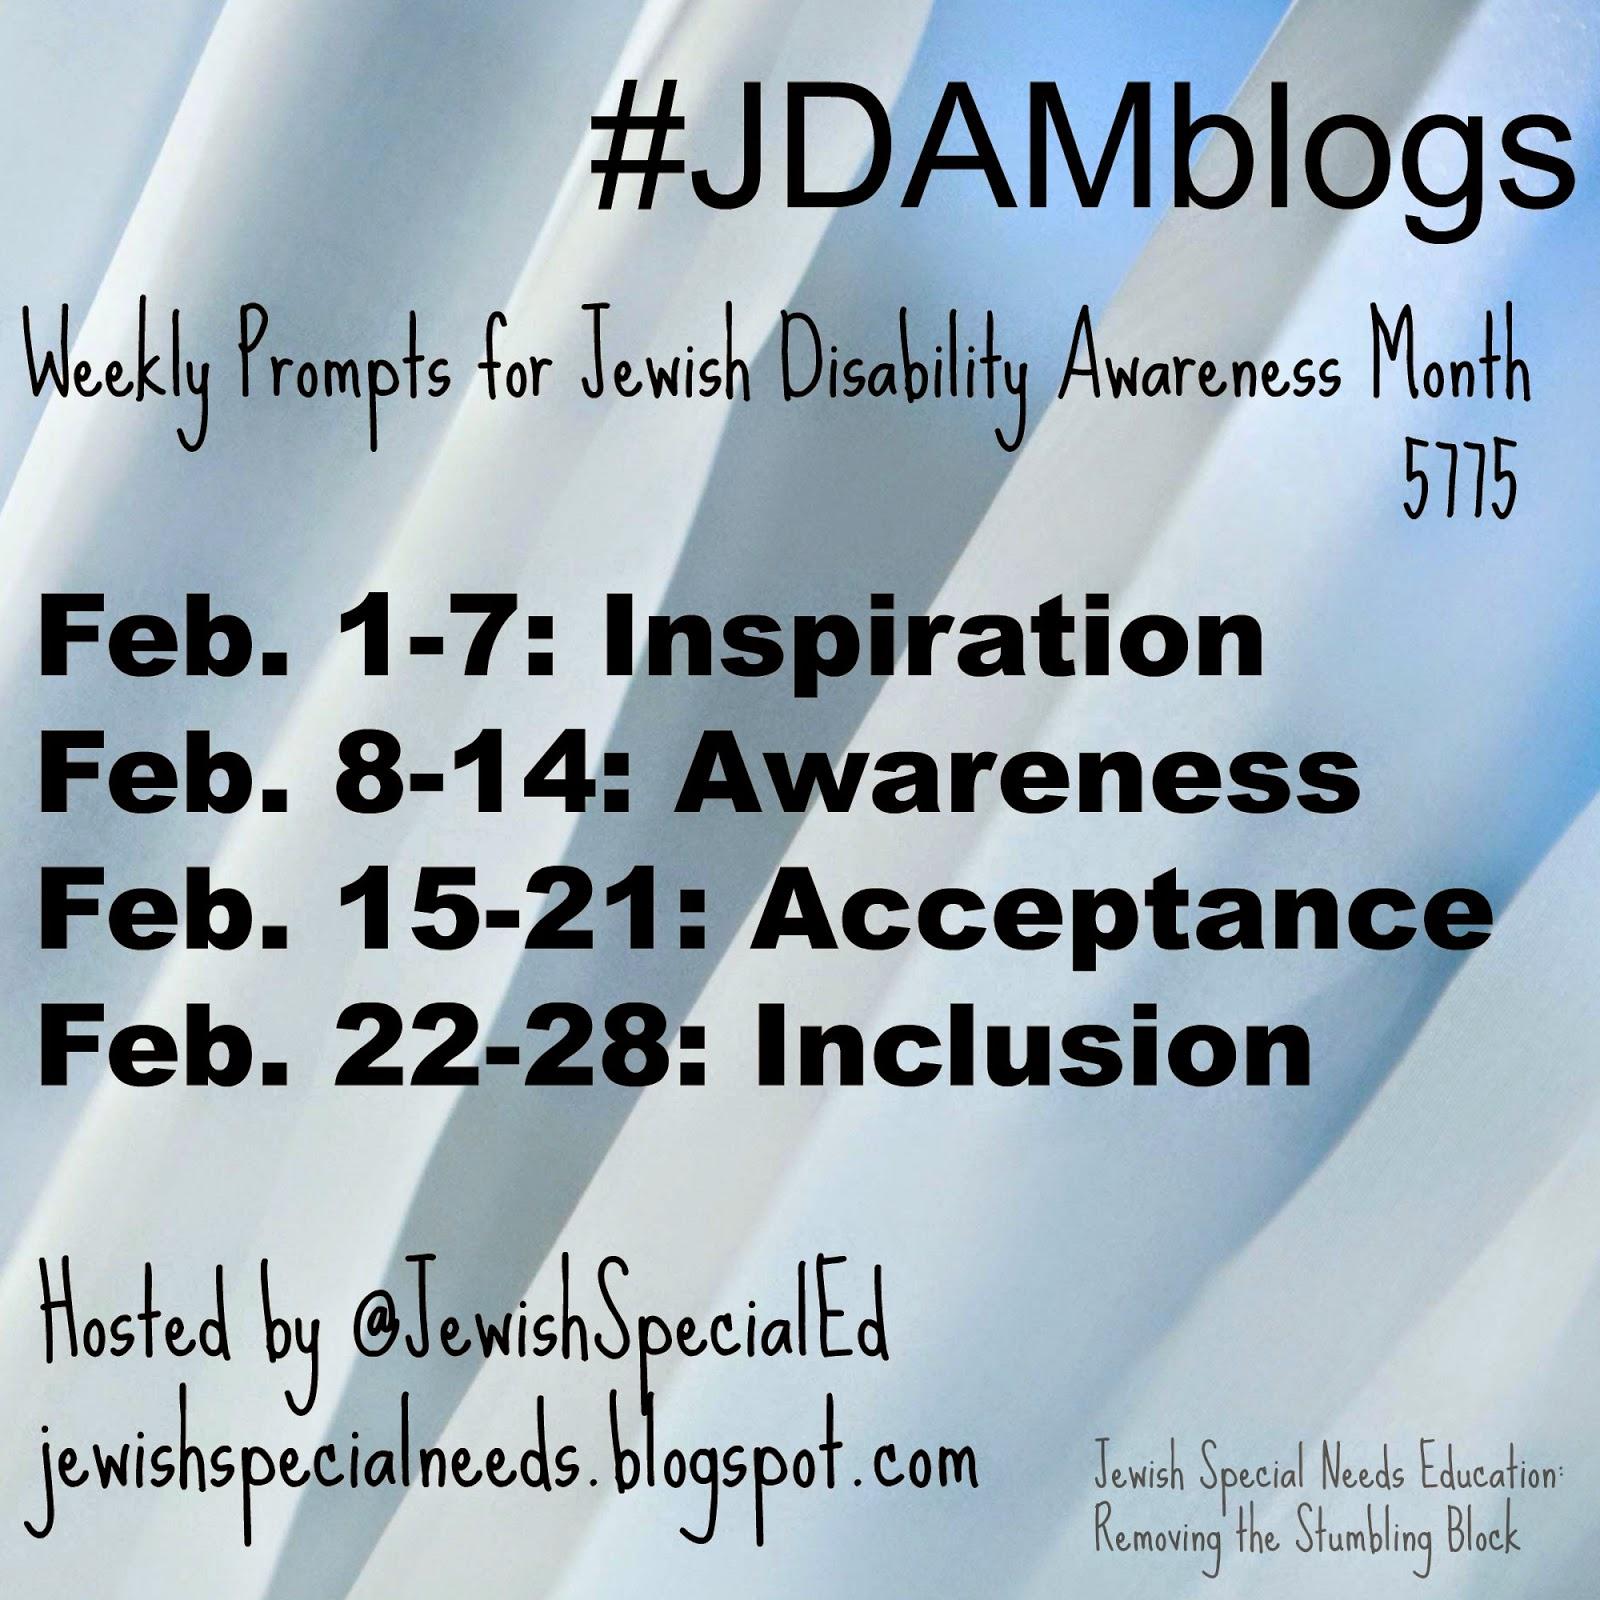 JDAMblogs, @JewishSpecialEd